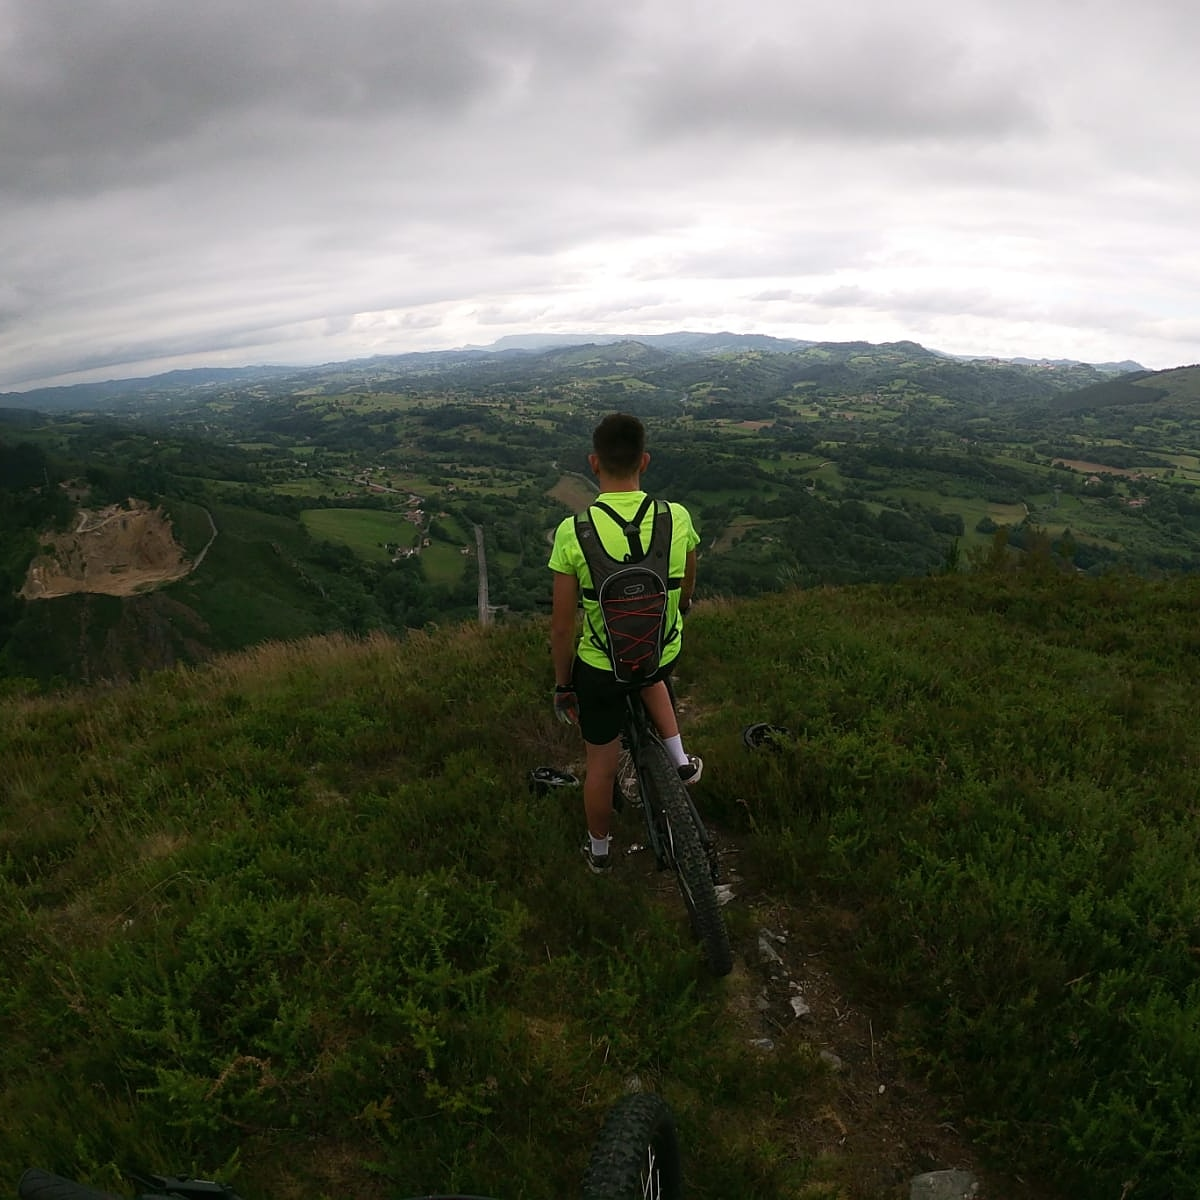 Disfruta de la sensación de libertad que te da la montaña. https://t.co/Sw2n0mnyEV #puraaventurayocio #bike #bikeinstagram #piloña #btt #turismoasturias #turismonacional  #ebike #bicielectrica #alquilerdebicicletaselectricas #vistapiloña #tierradeasturcones https://t.co/ttH4xHuEJK